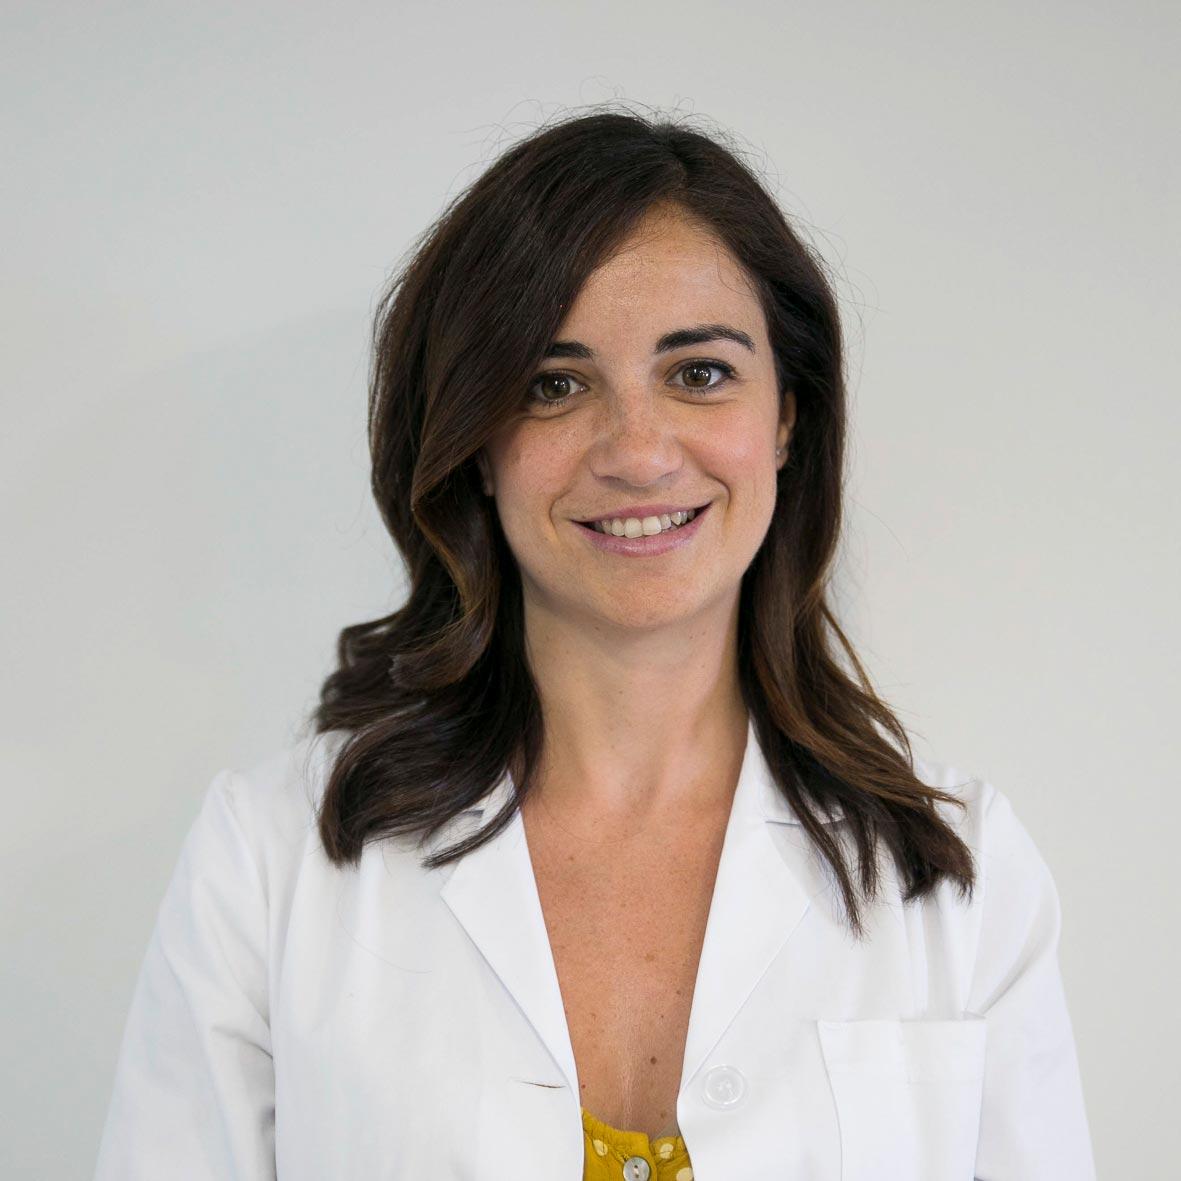 Dra. Elena Santiago Romero